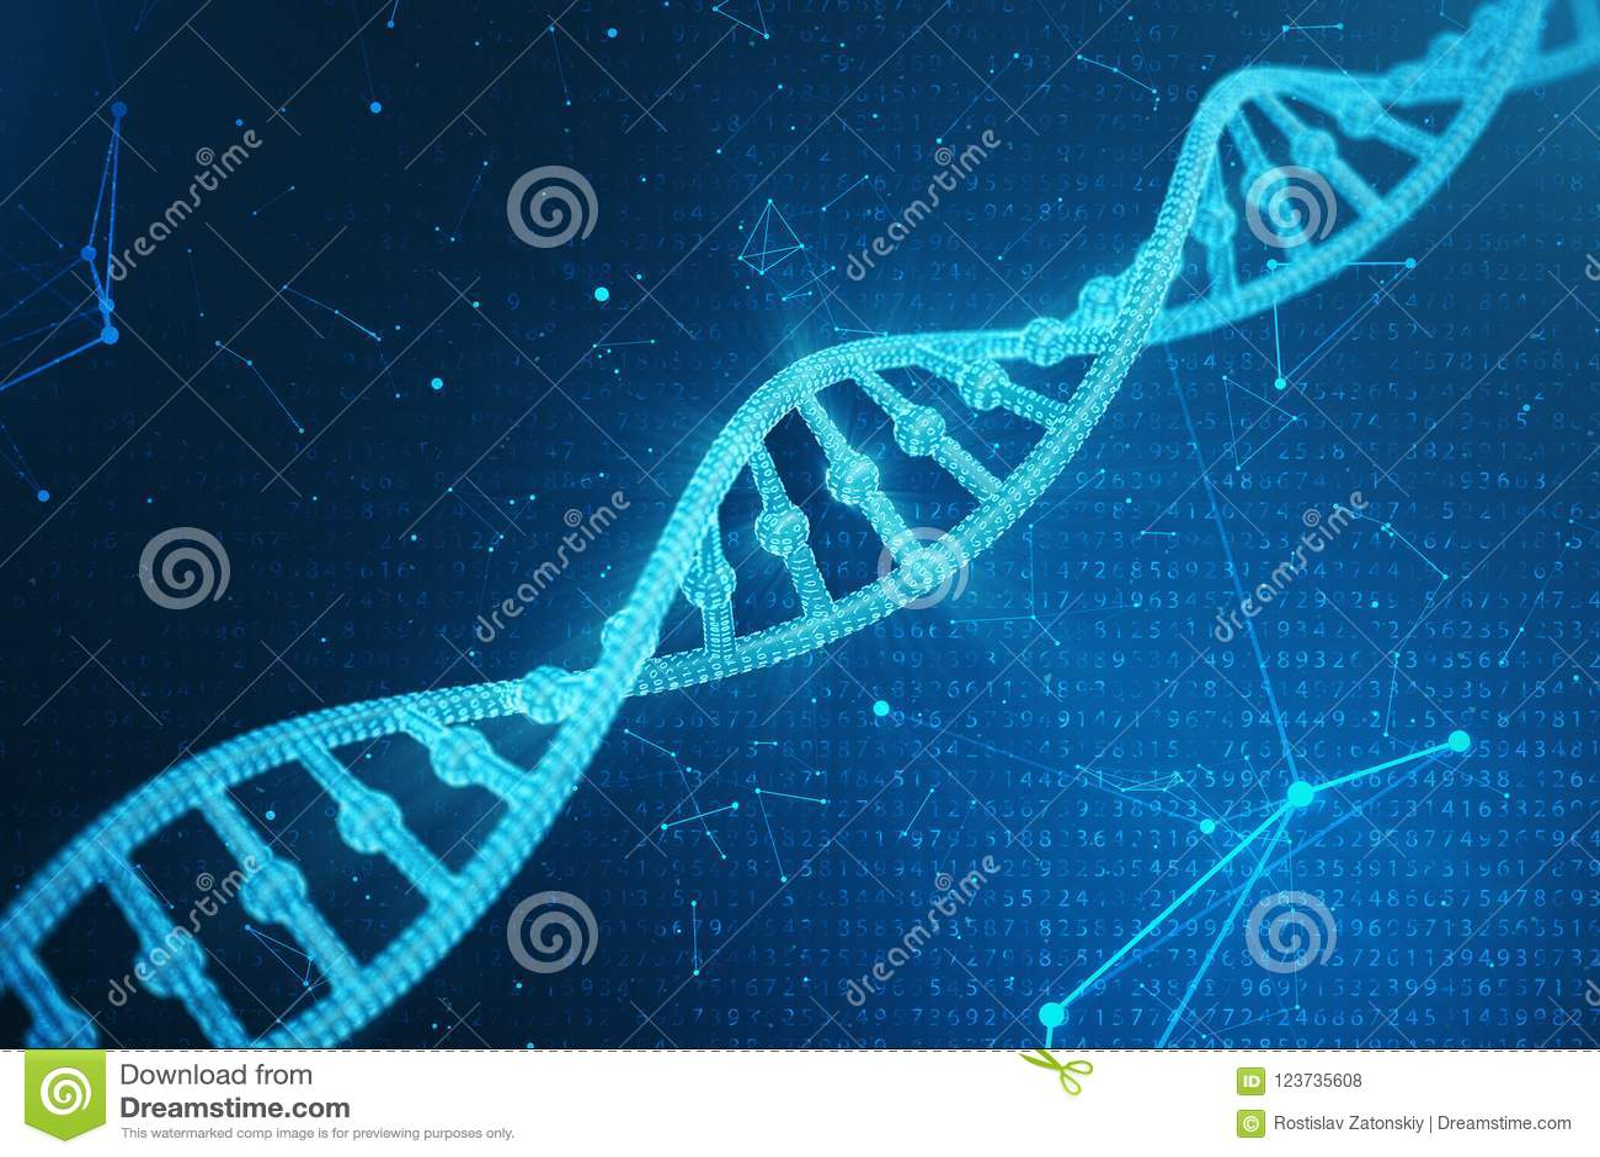 Molécula De La Dna De Digitaces Estructura Genoma Humano